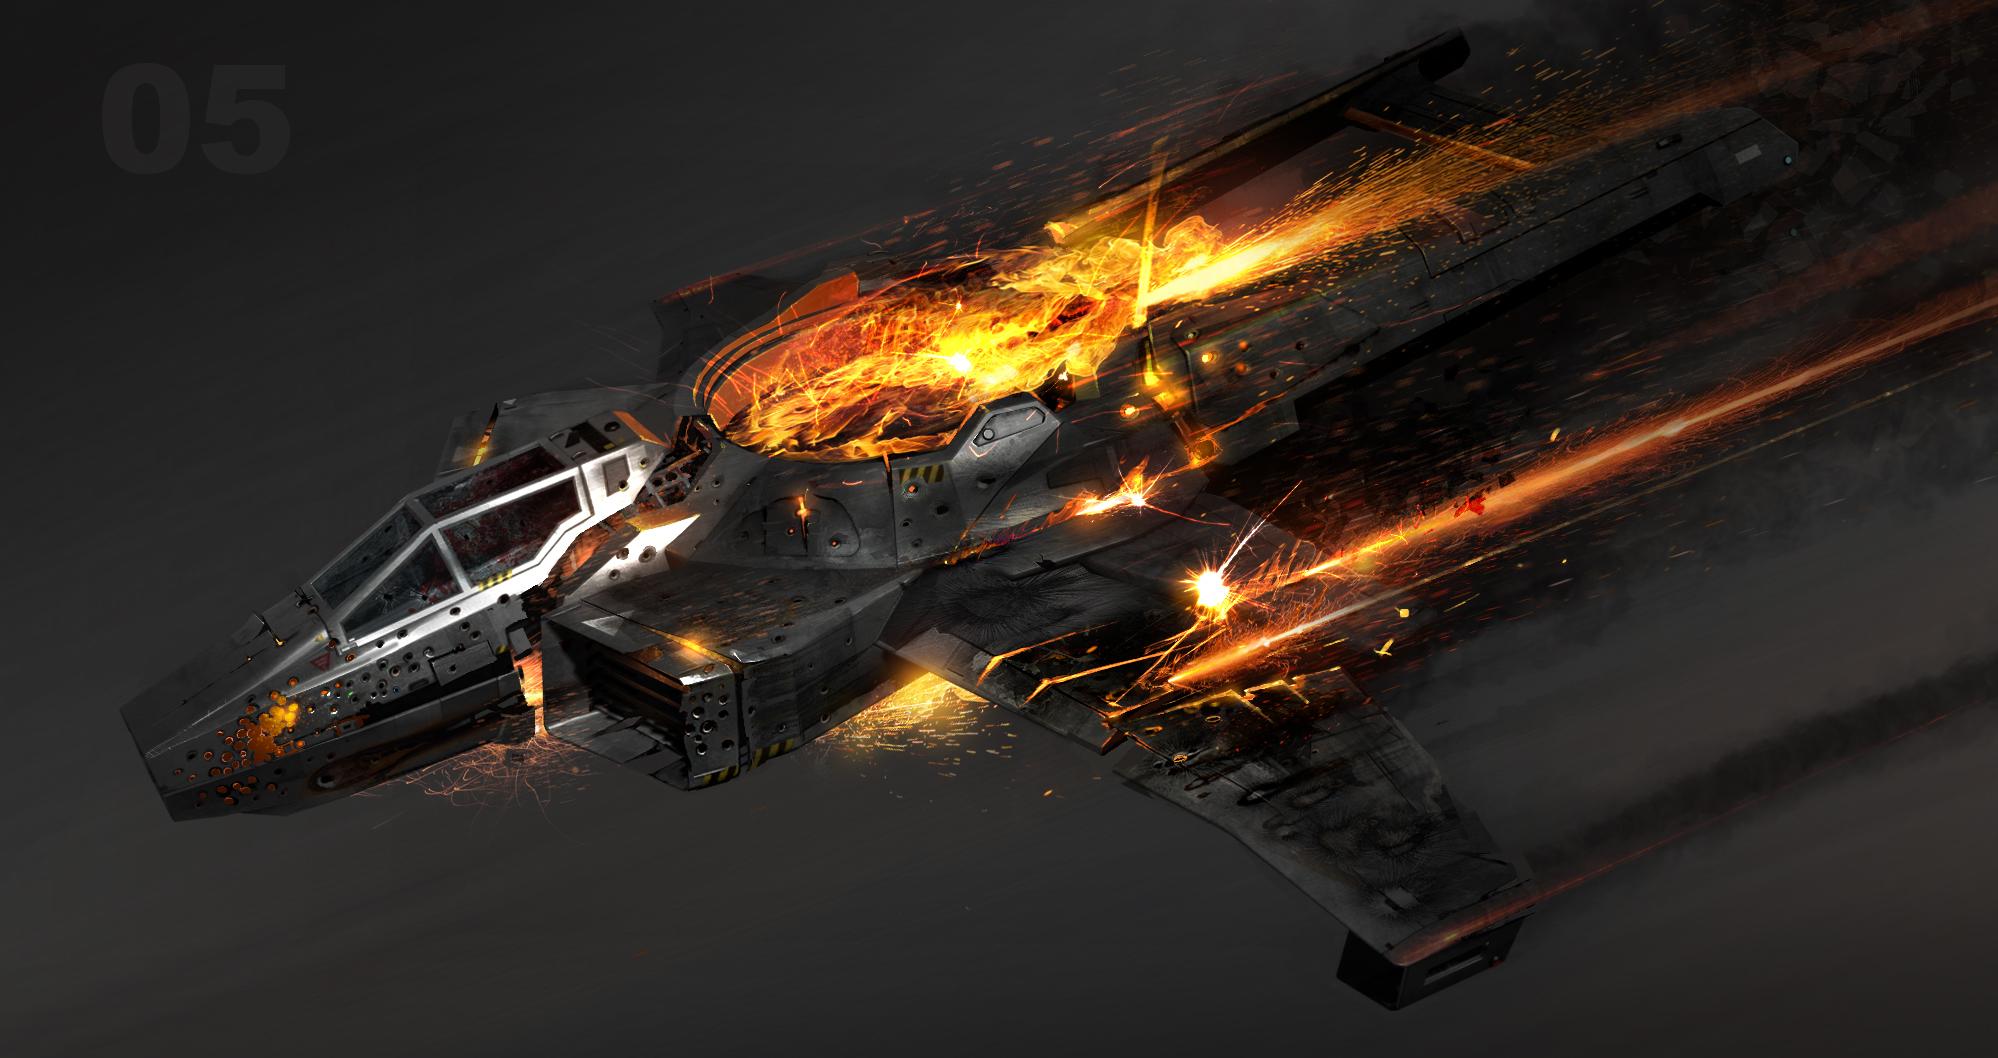 Hornet_F7C_Battle_Damage_05